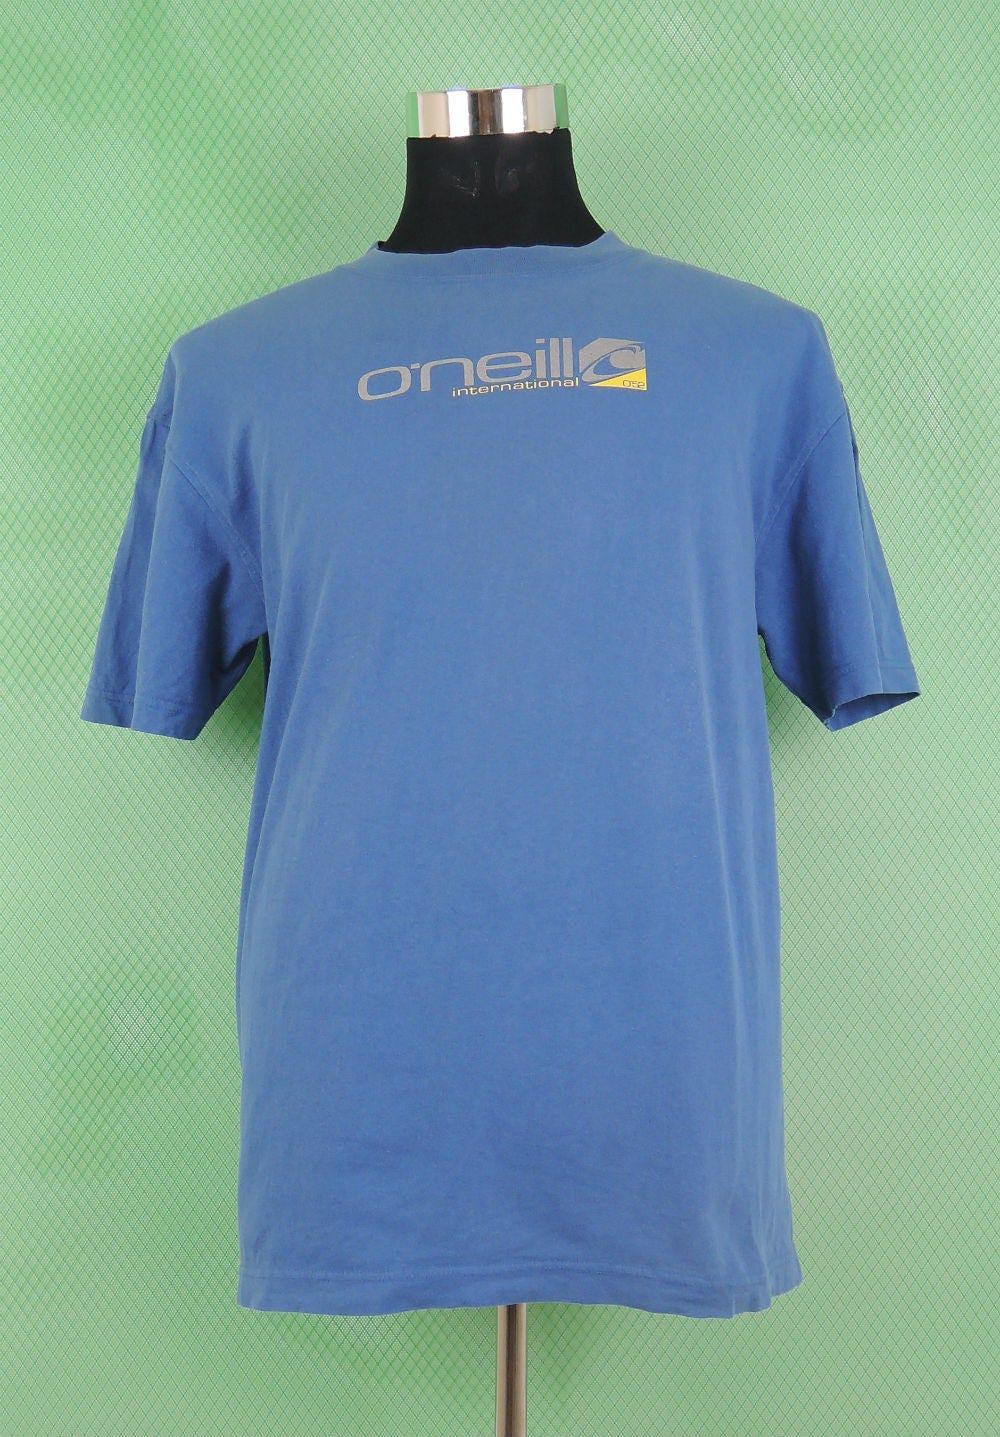 1367664ab6bd Vintage o   Niell T-Shirt surf planche extérieure Tee Top L taille L ...